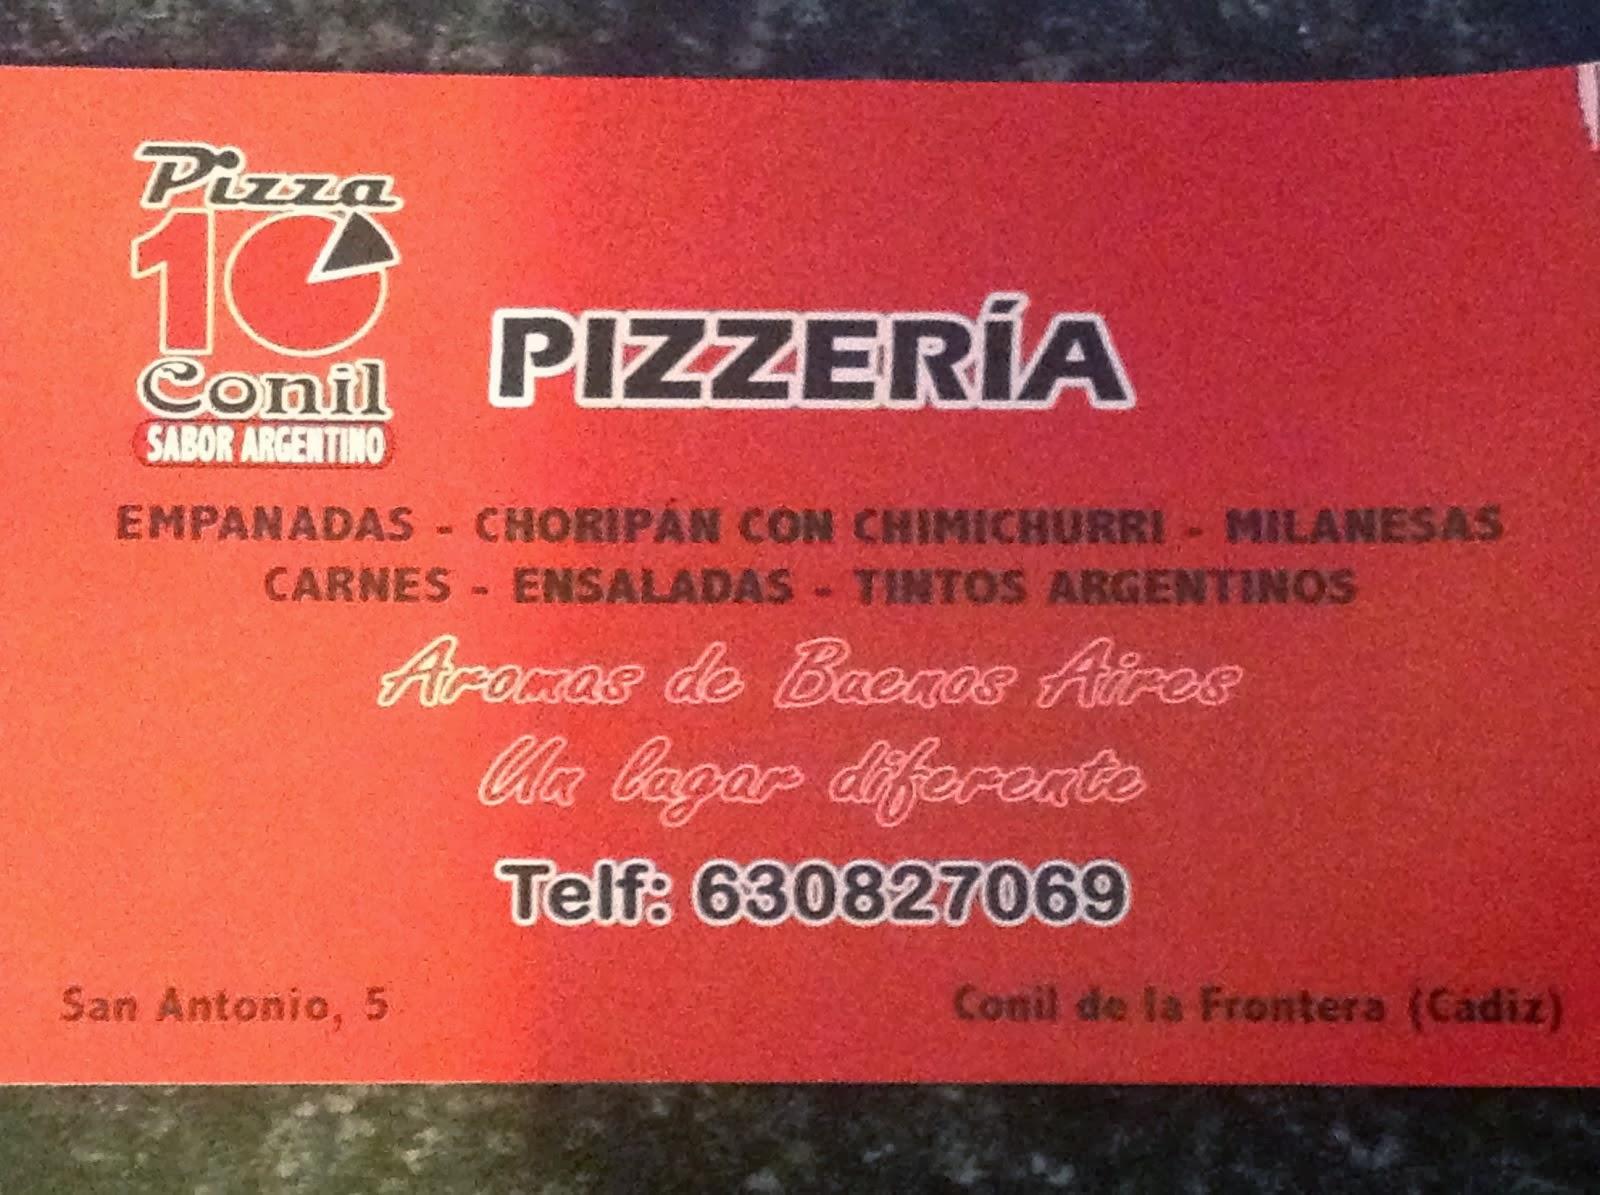 PIZZA 10 El Argentino